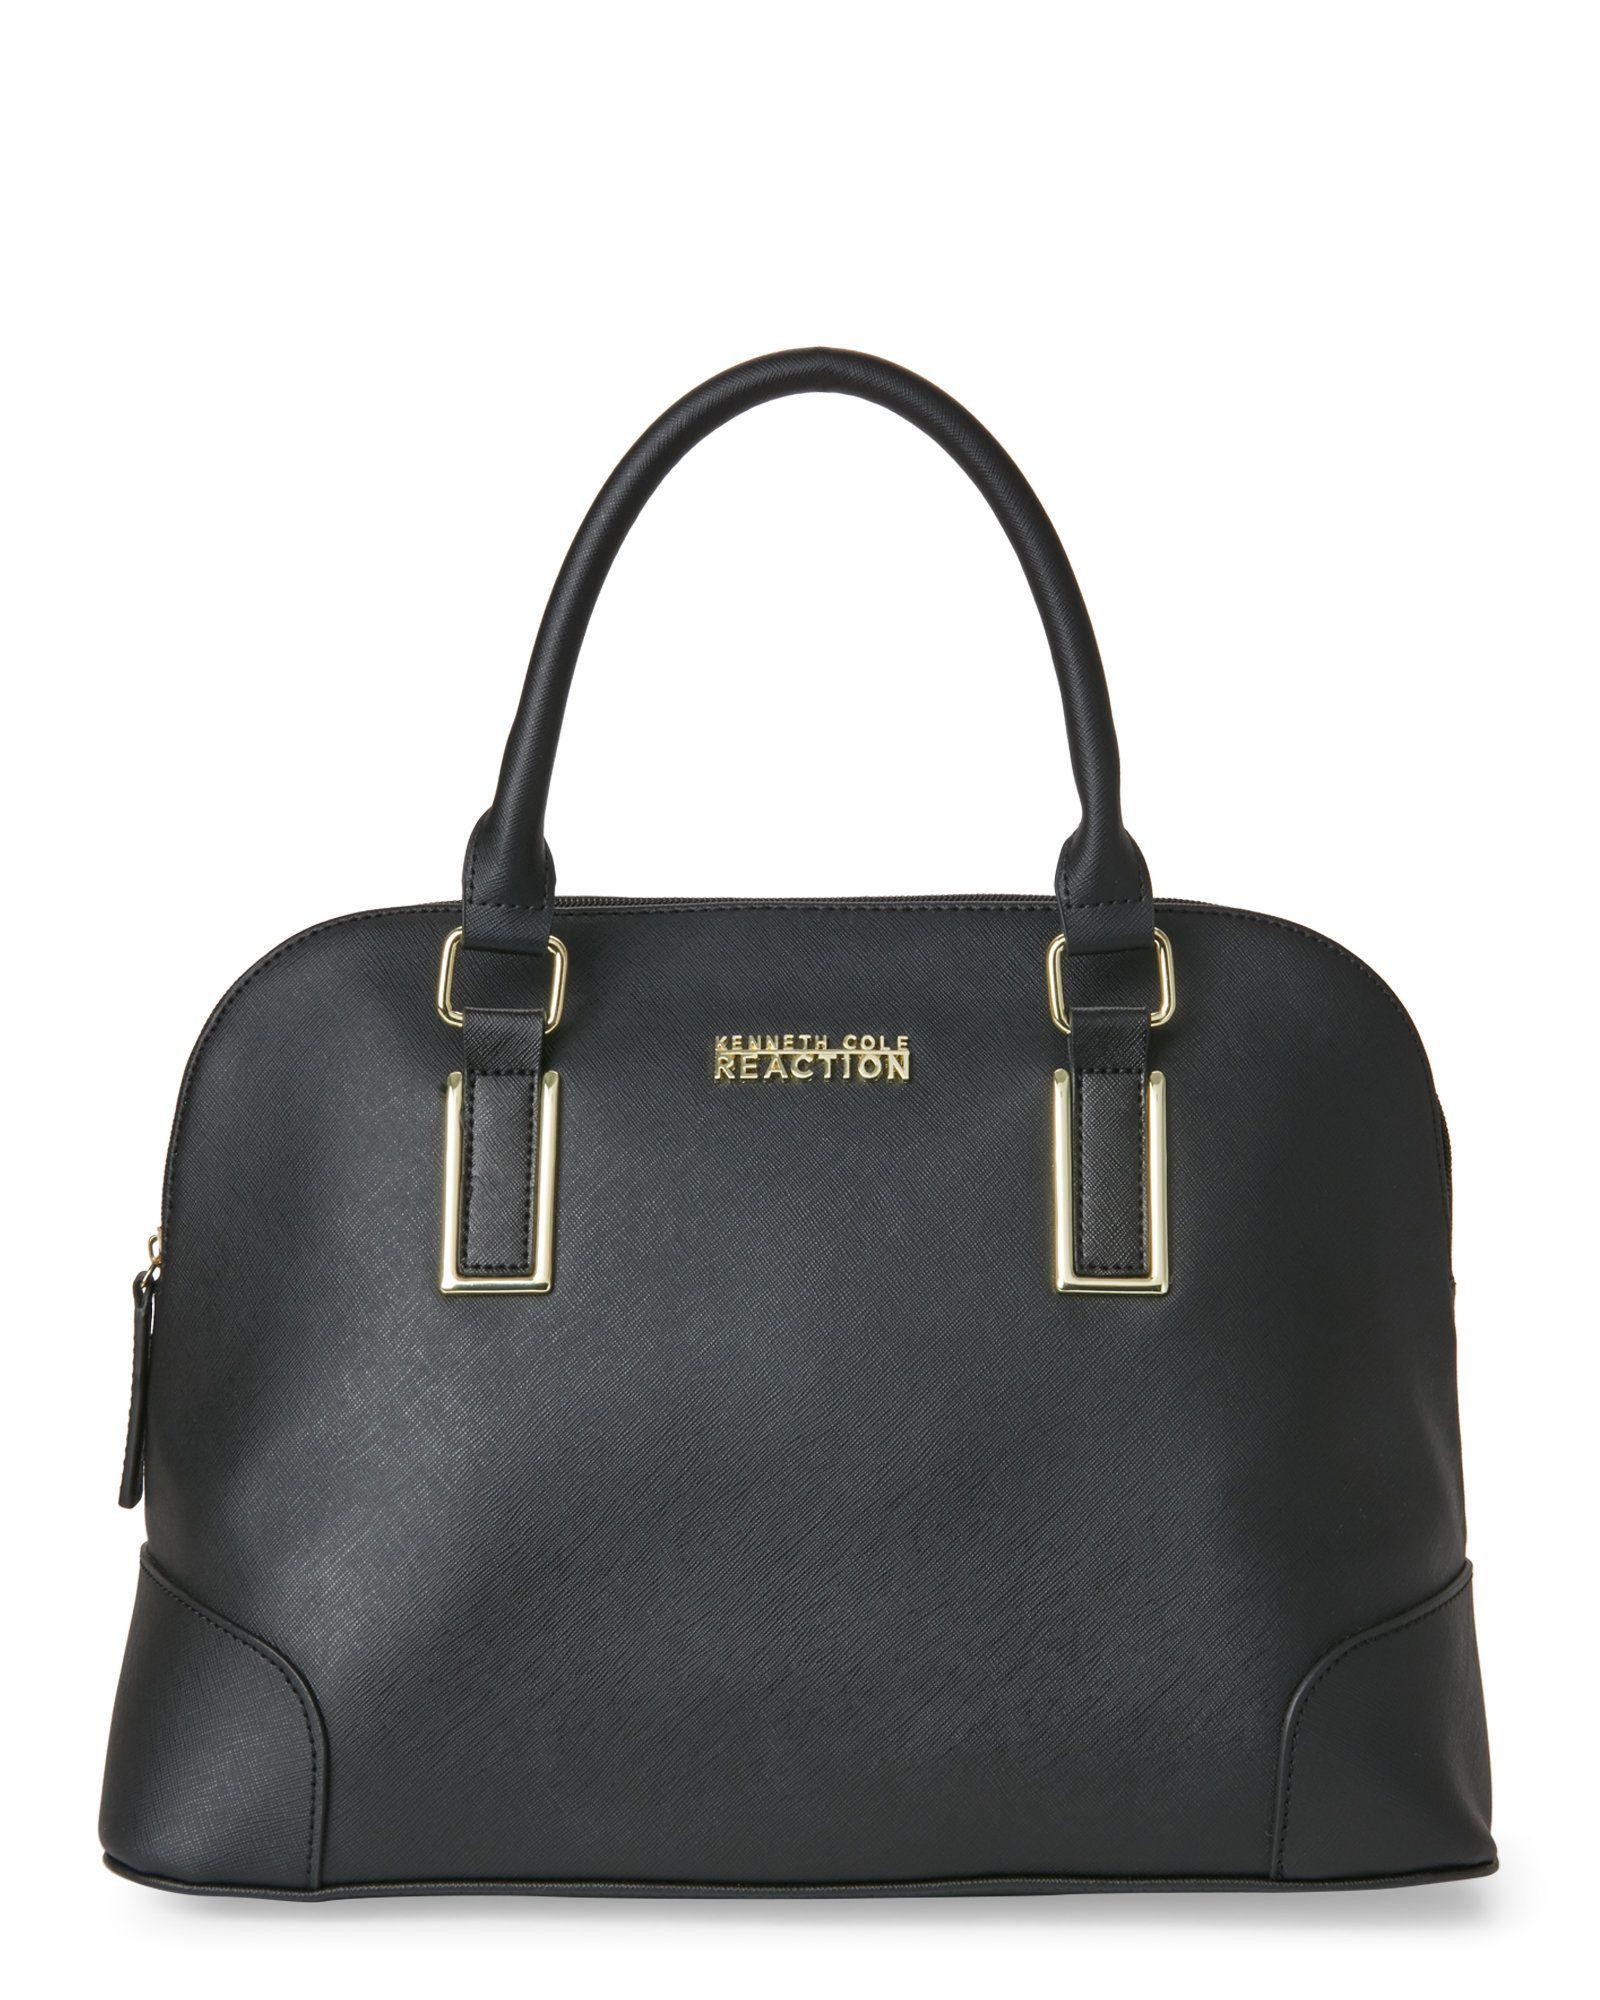 Kenneth Cole Reaction handbag Kenneth Cole Handbags c327159c587f3